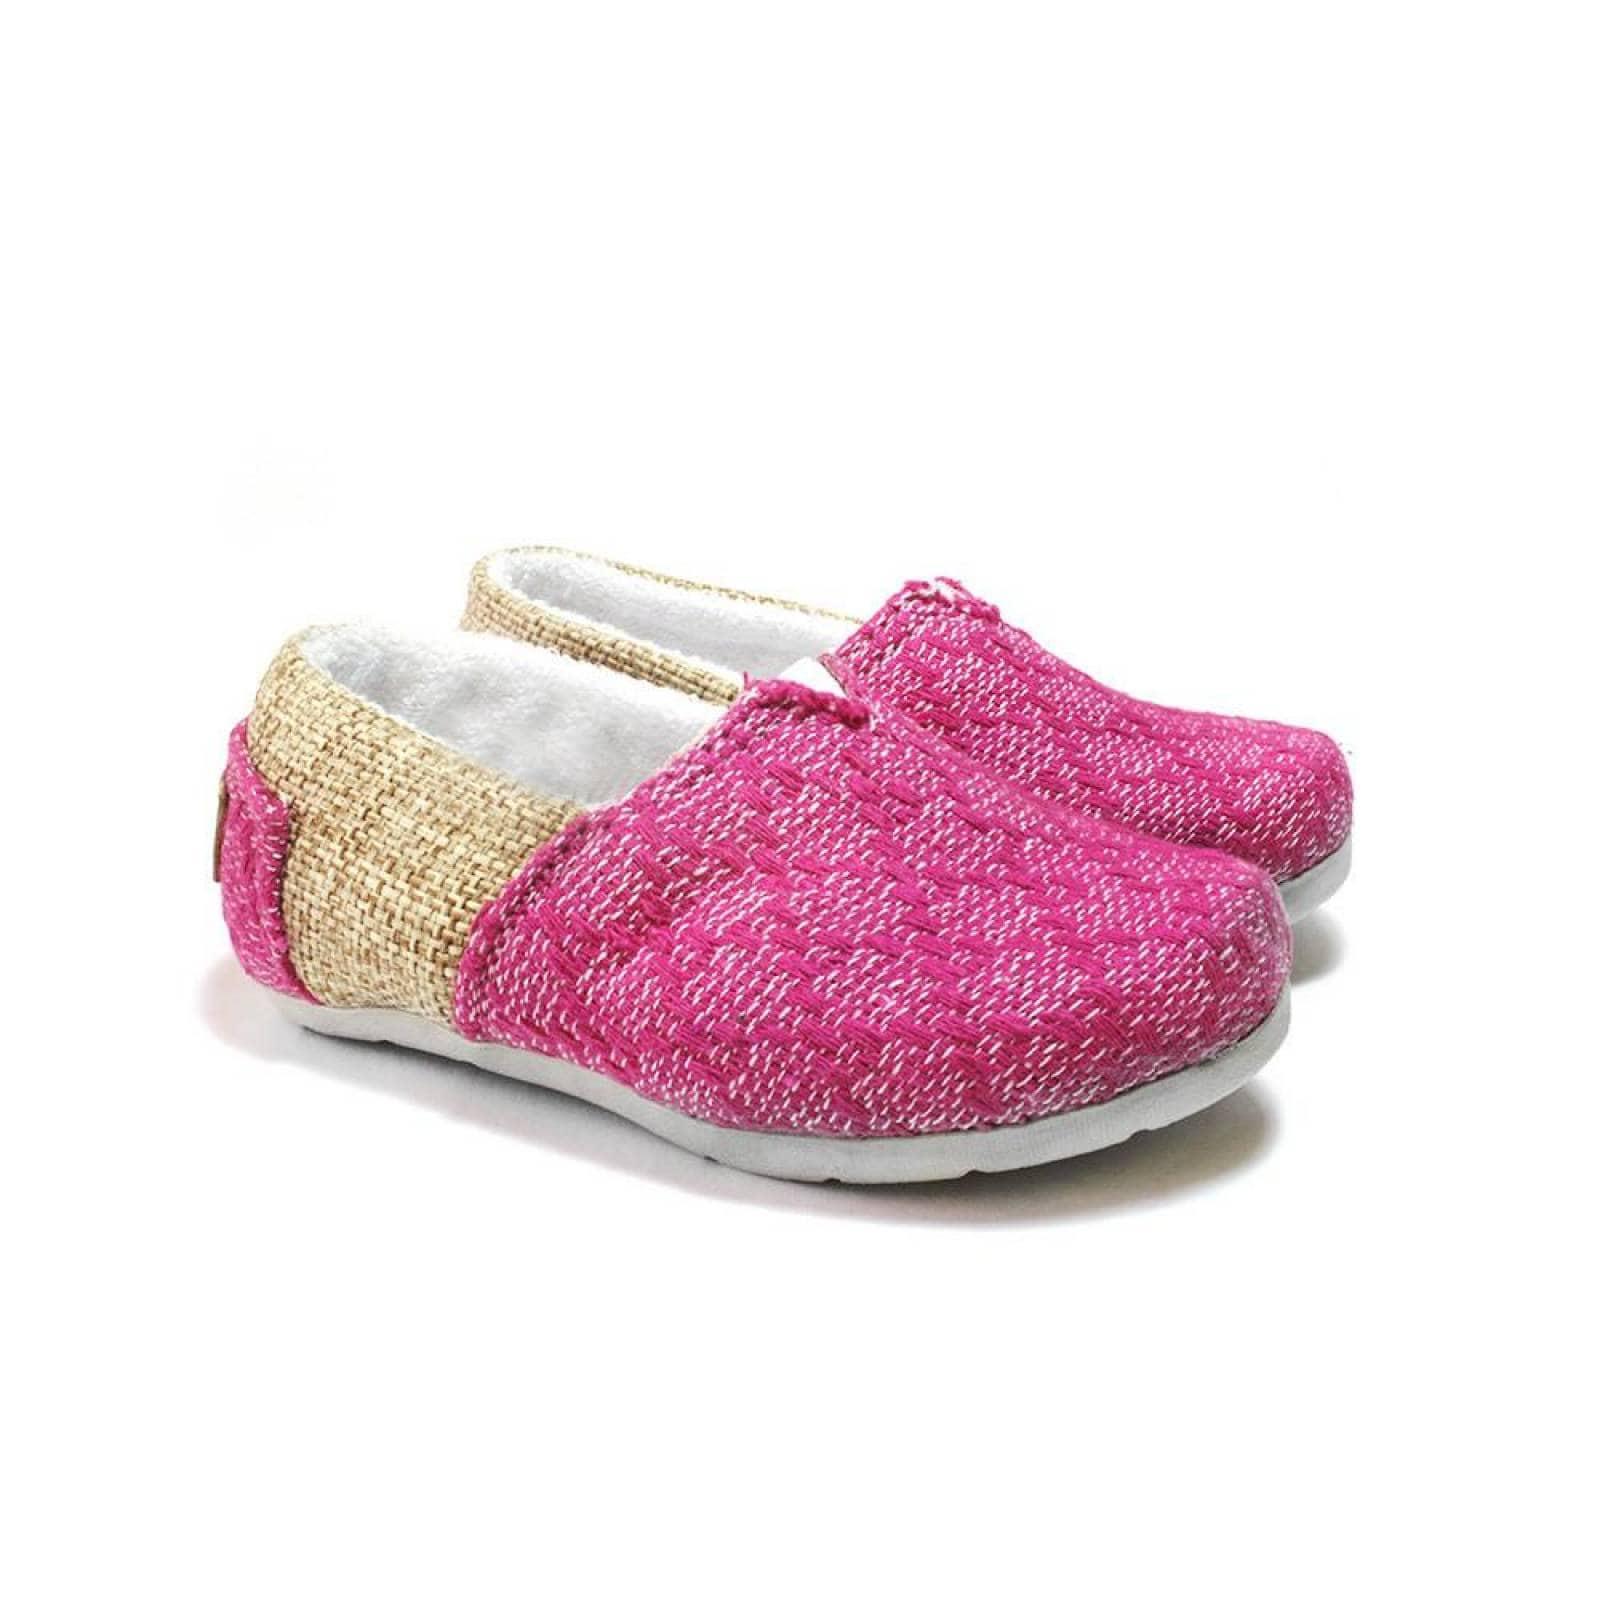 Zapato Alpargata Mini Jacinta Artesanal Tela Infantil Coral Komoni Talla: 12